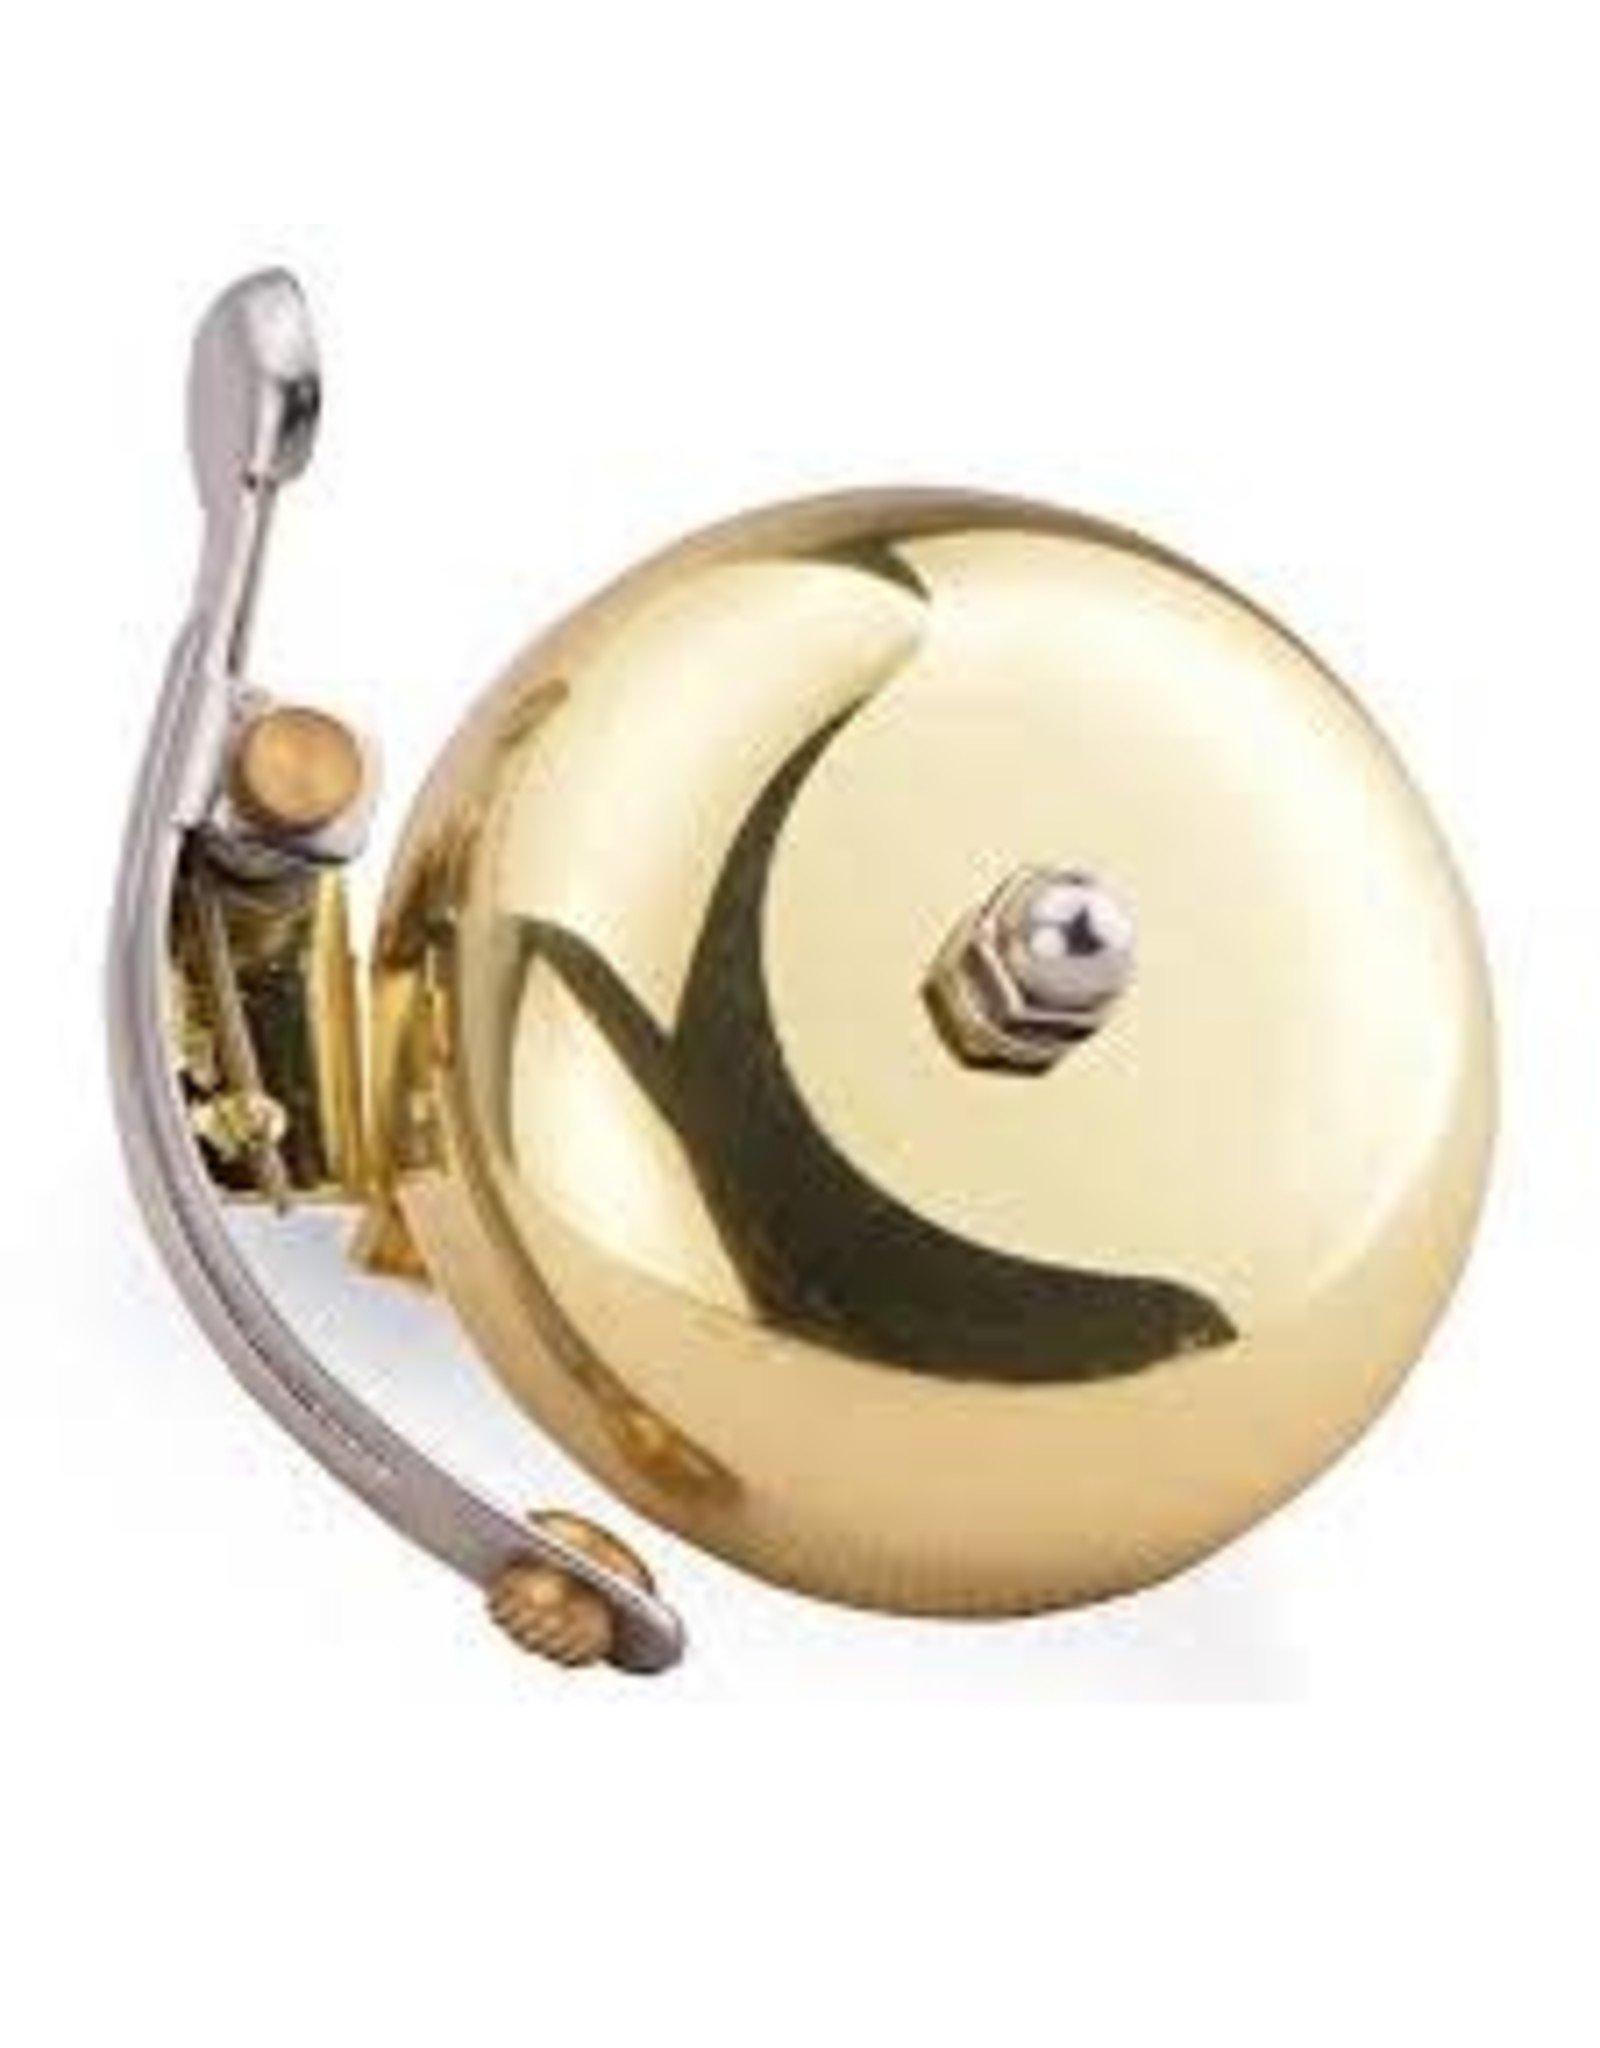 PRO SERIES Bell Brass Top Flick Top 25.4mm